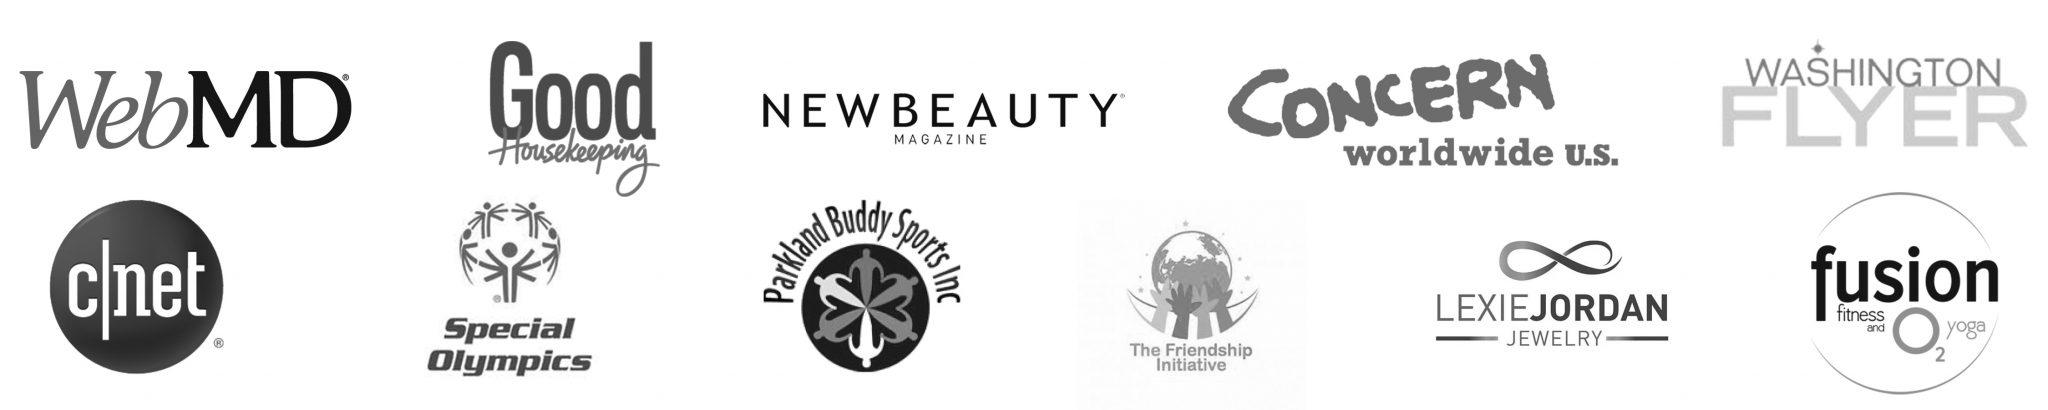 logos-for-cc